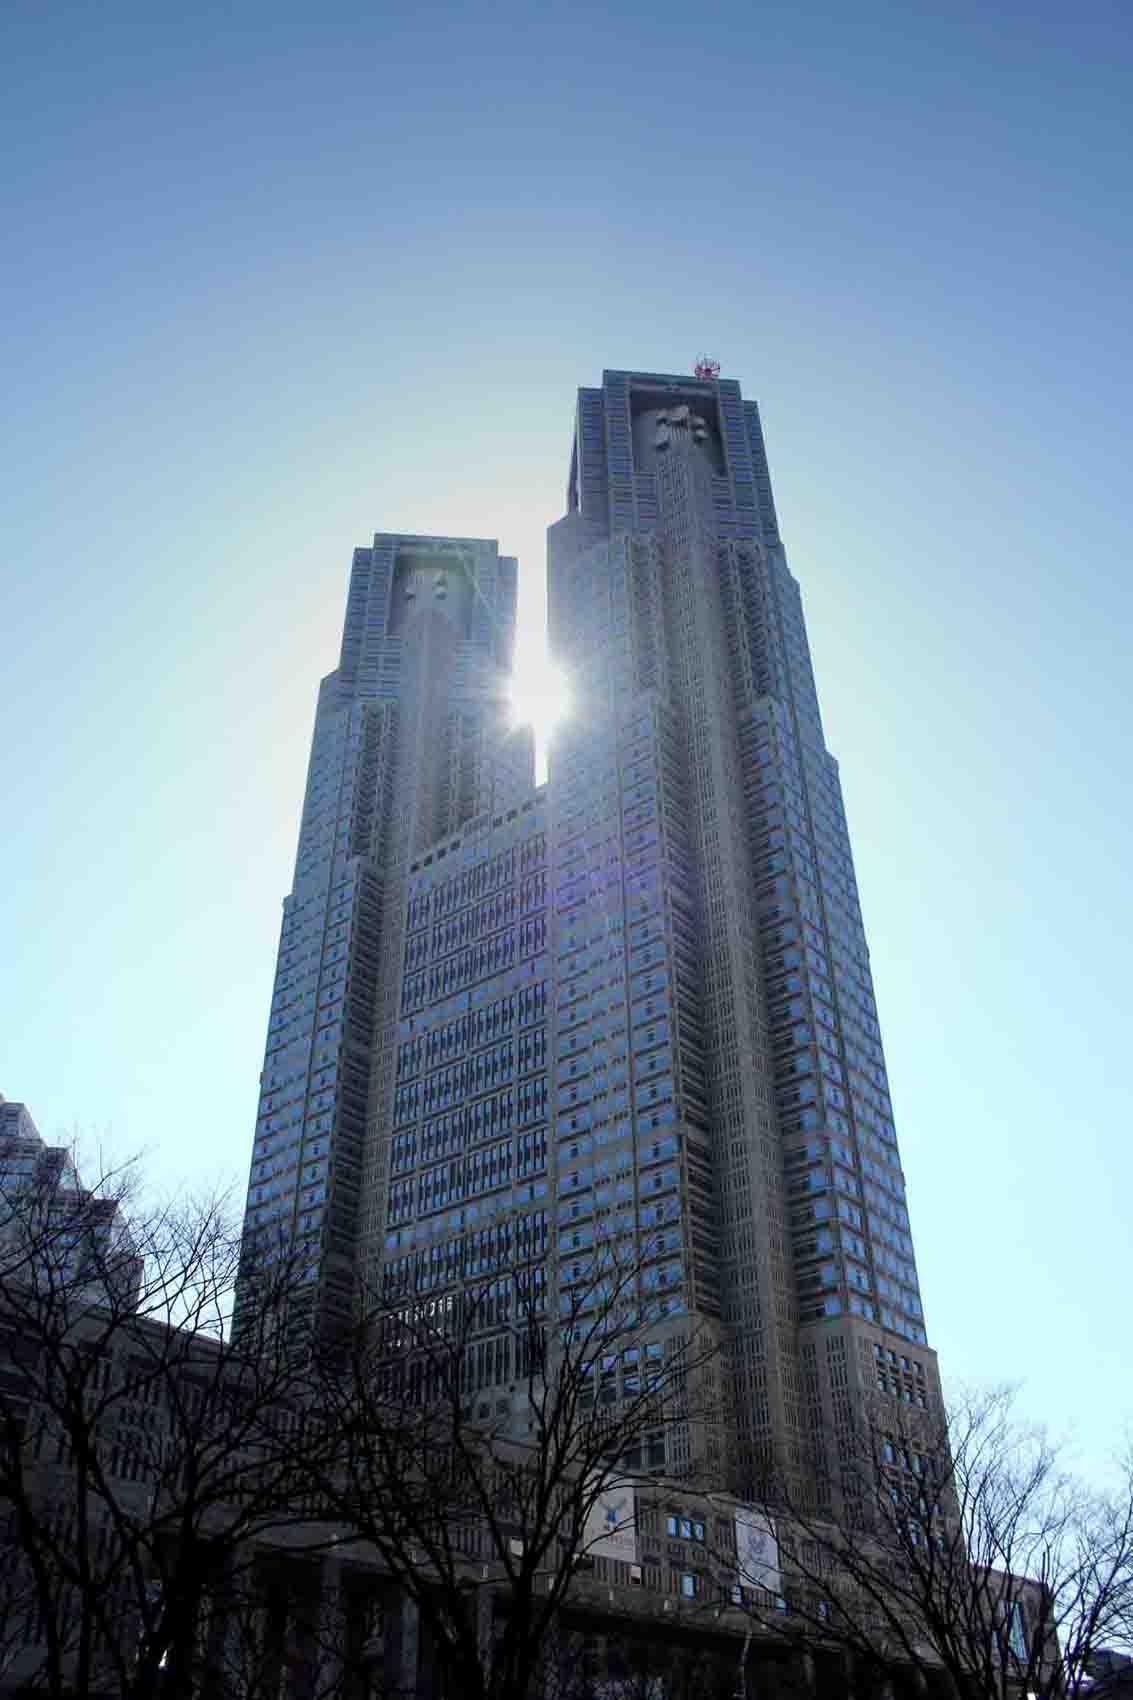 Tokyo Metropolitan Government Building, Rathaus, City Hall